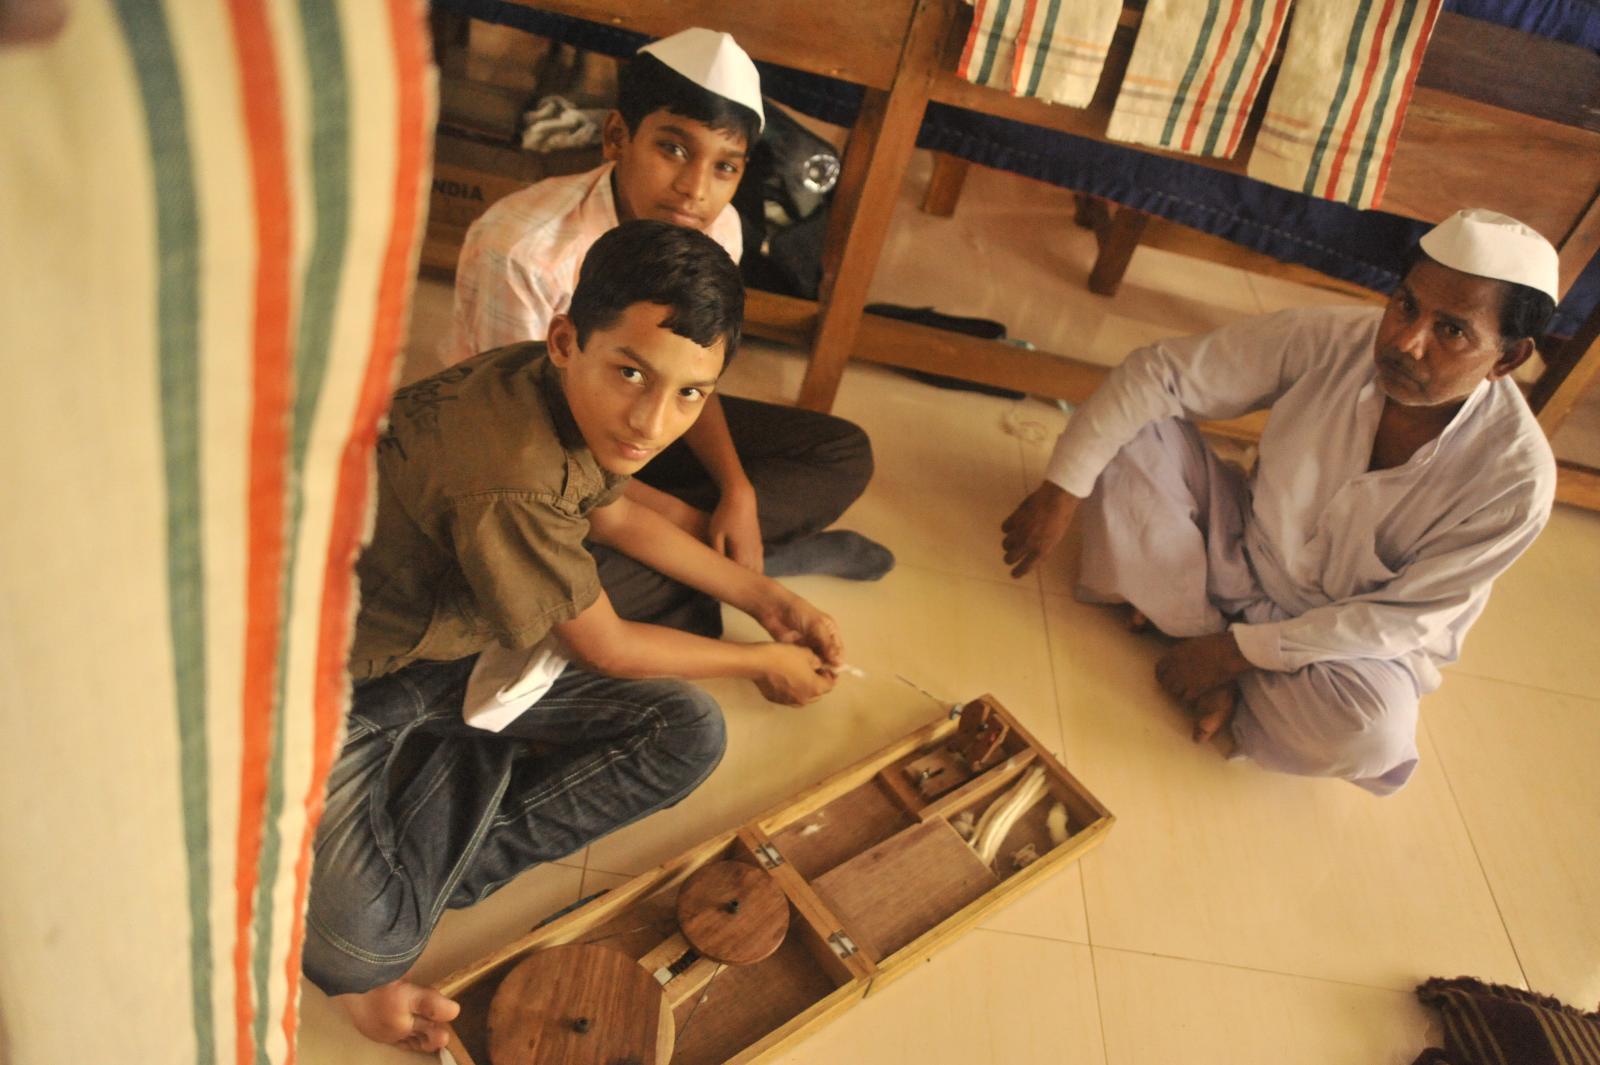 Gandhis in making.. hopefully at least gandhism